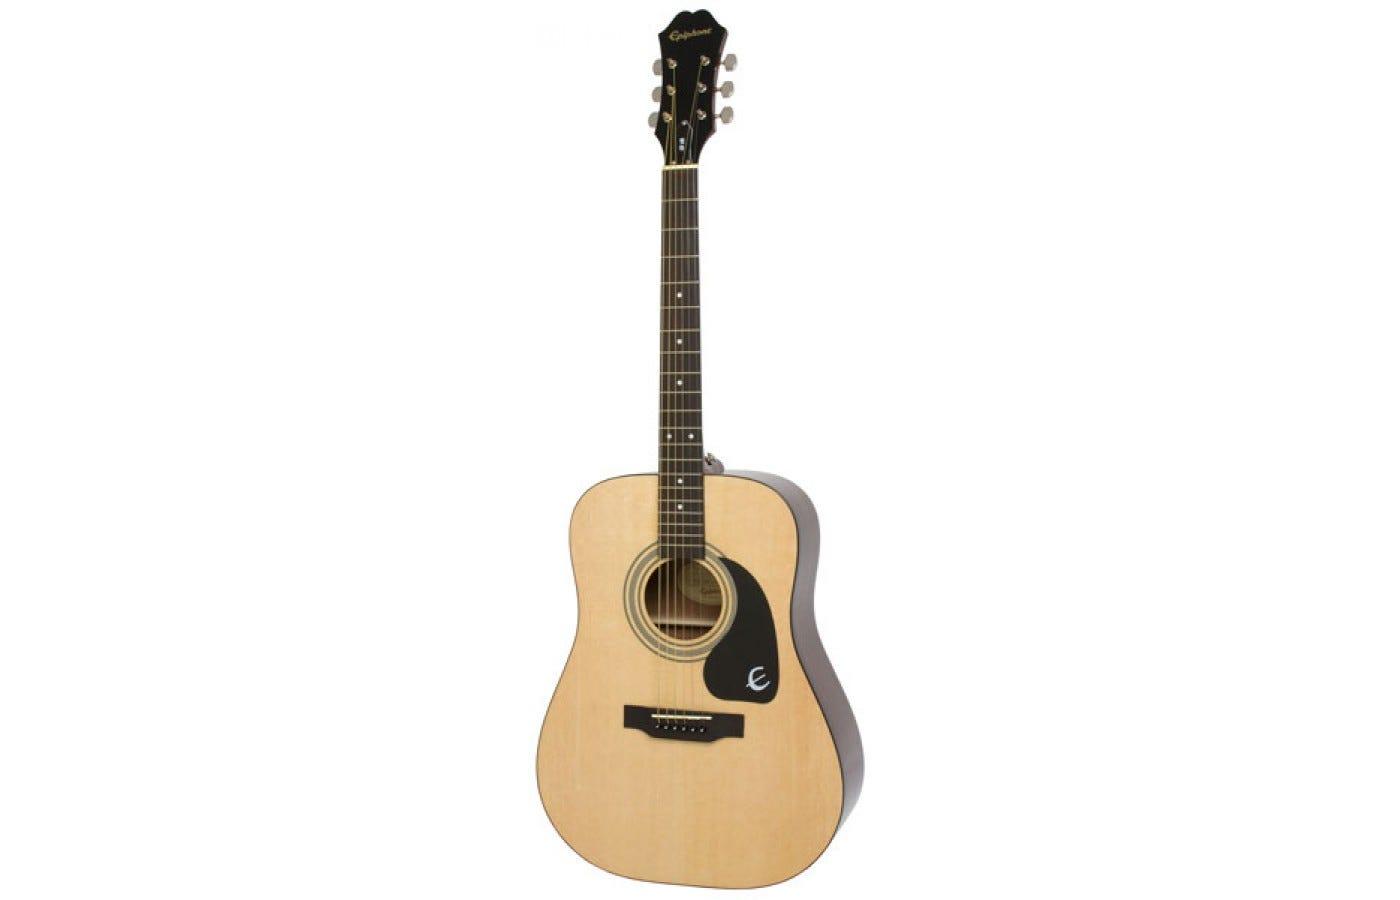 Epiphone DR-100 Acoustic Guitar - Natural